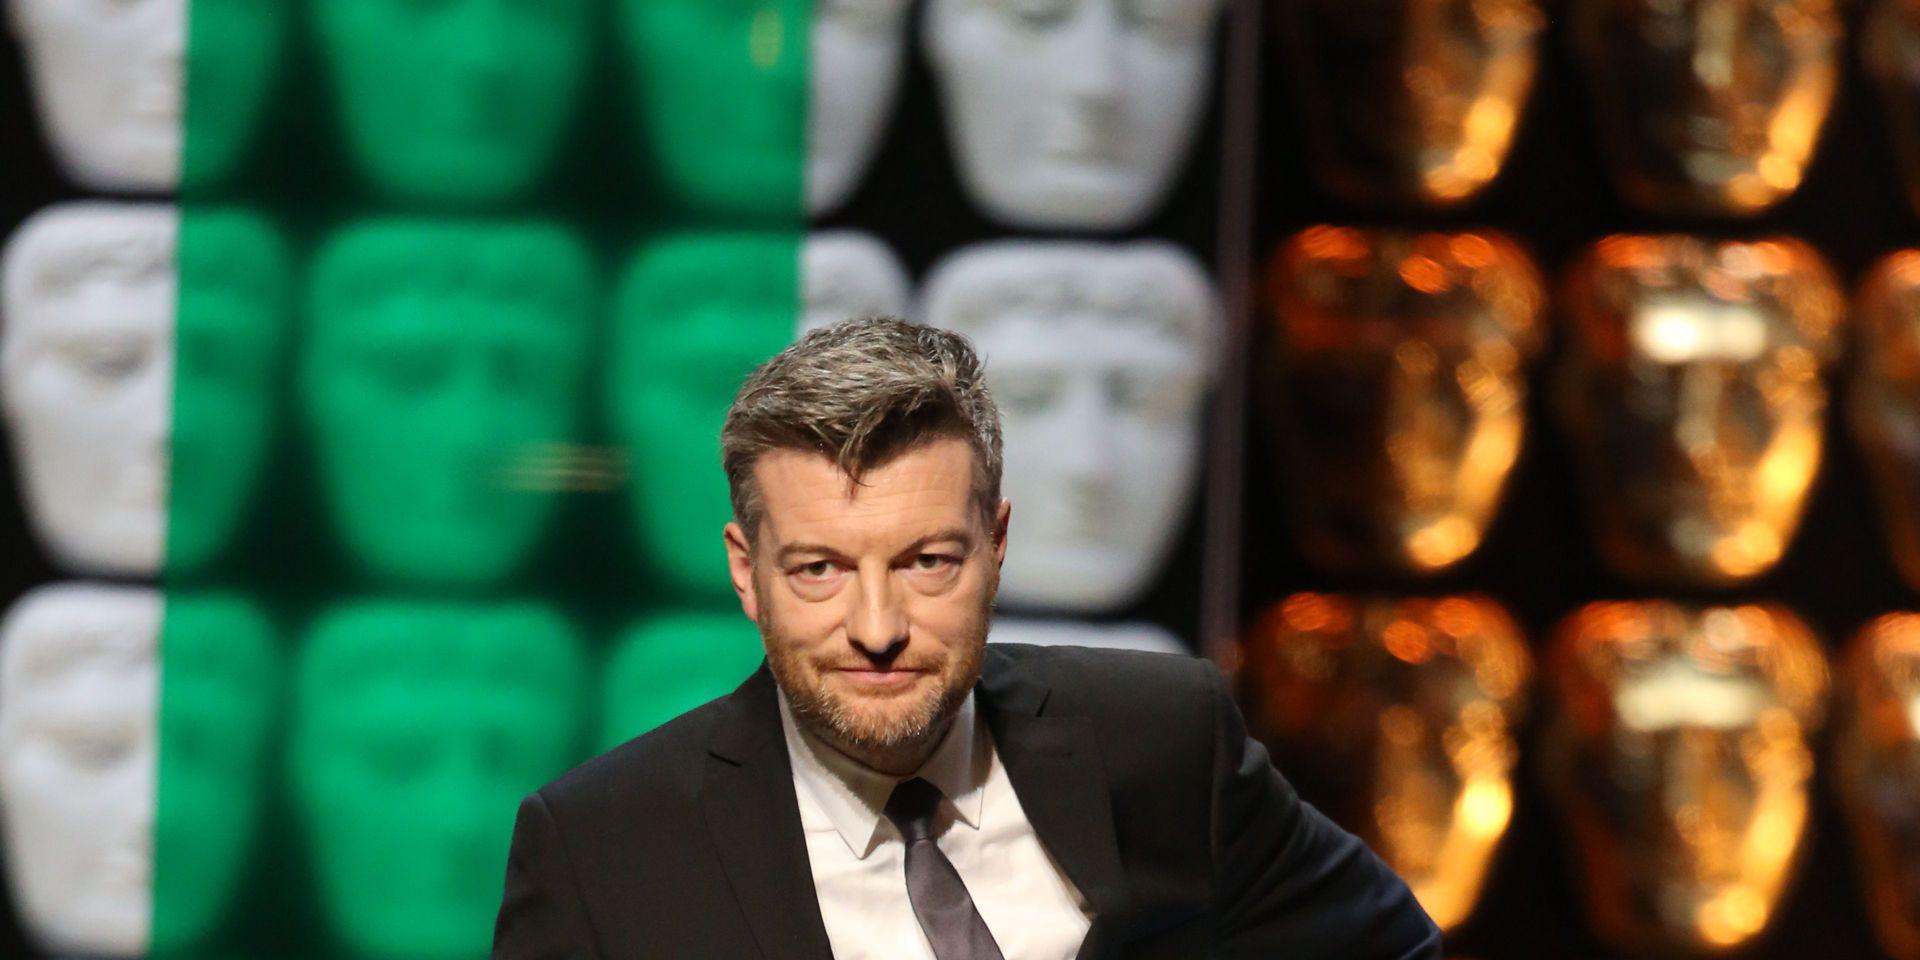 Charlie Brooker at the British Academy Television Awards 2015